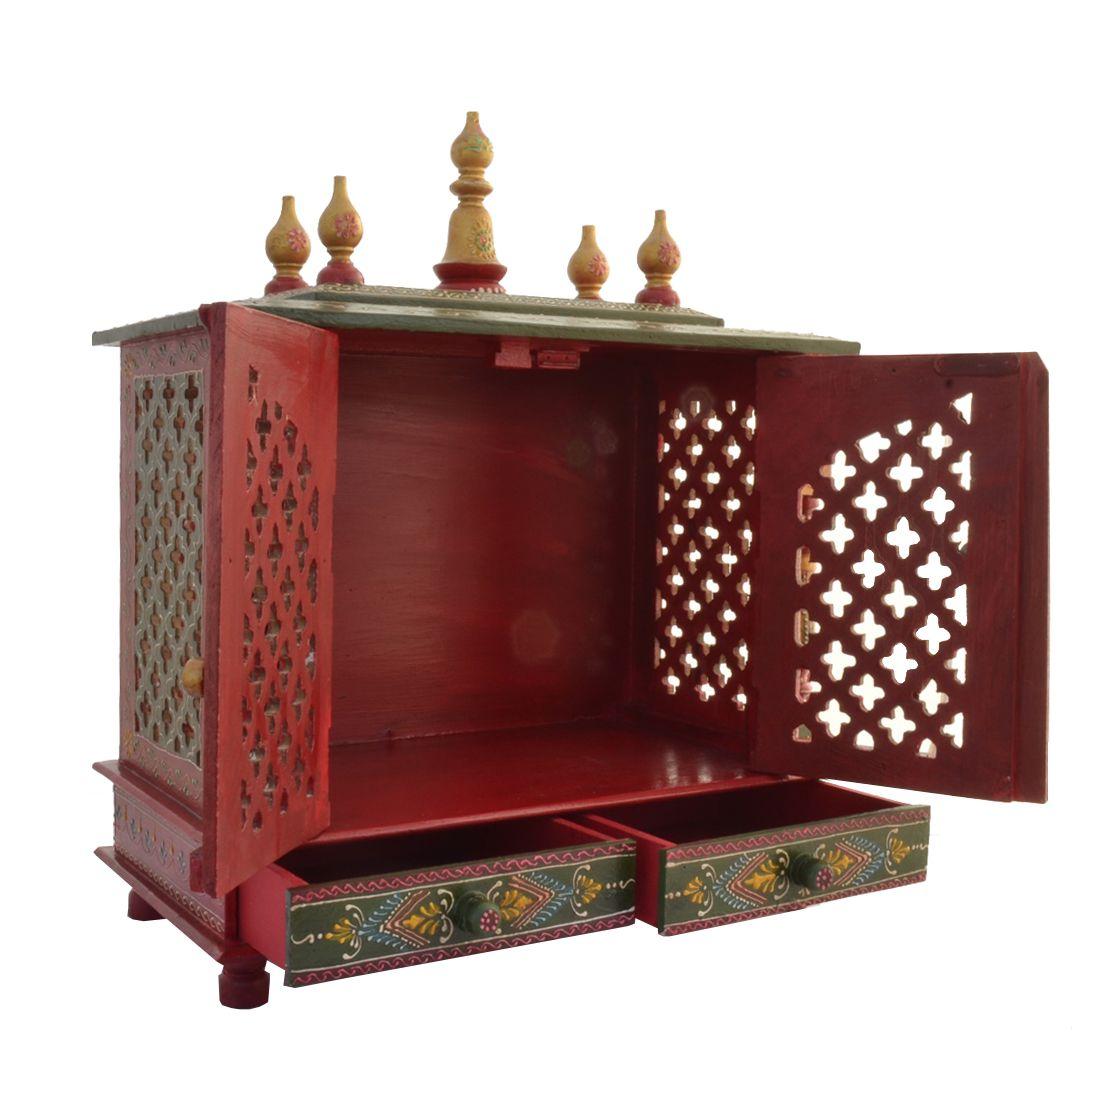 Jodhpur Handicrafts Red Wood Hanging Mandir: Buy Jodhpur